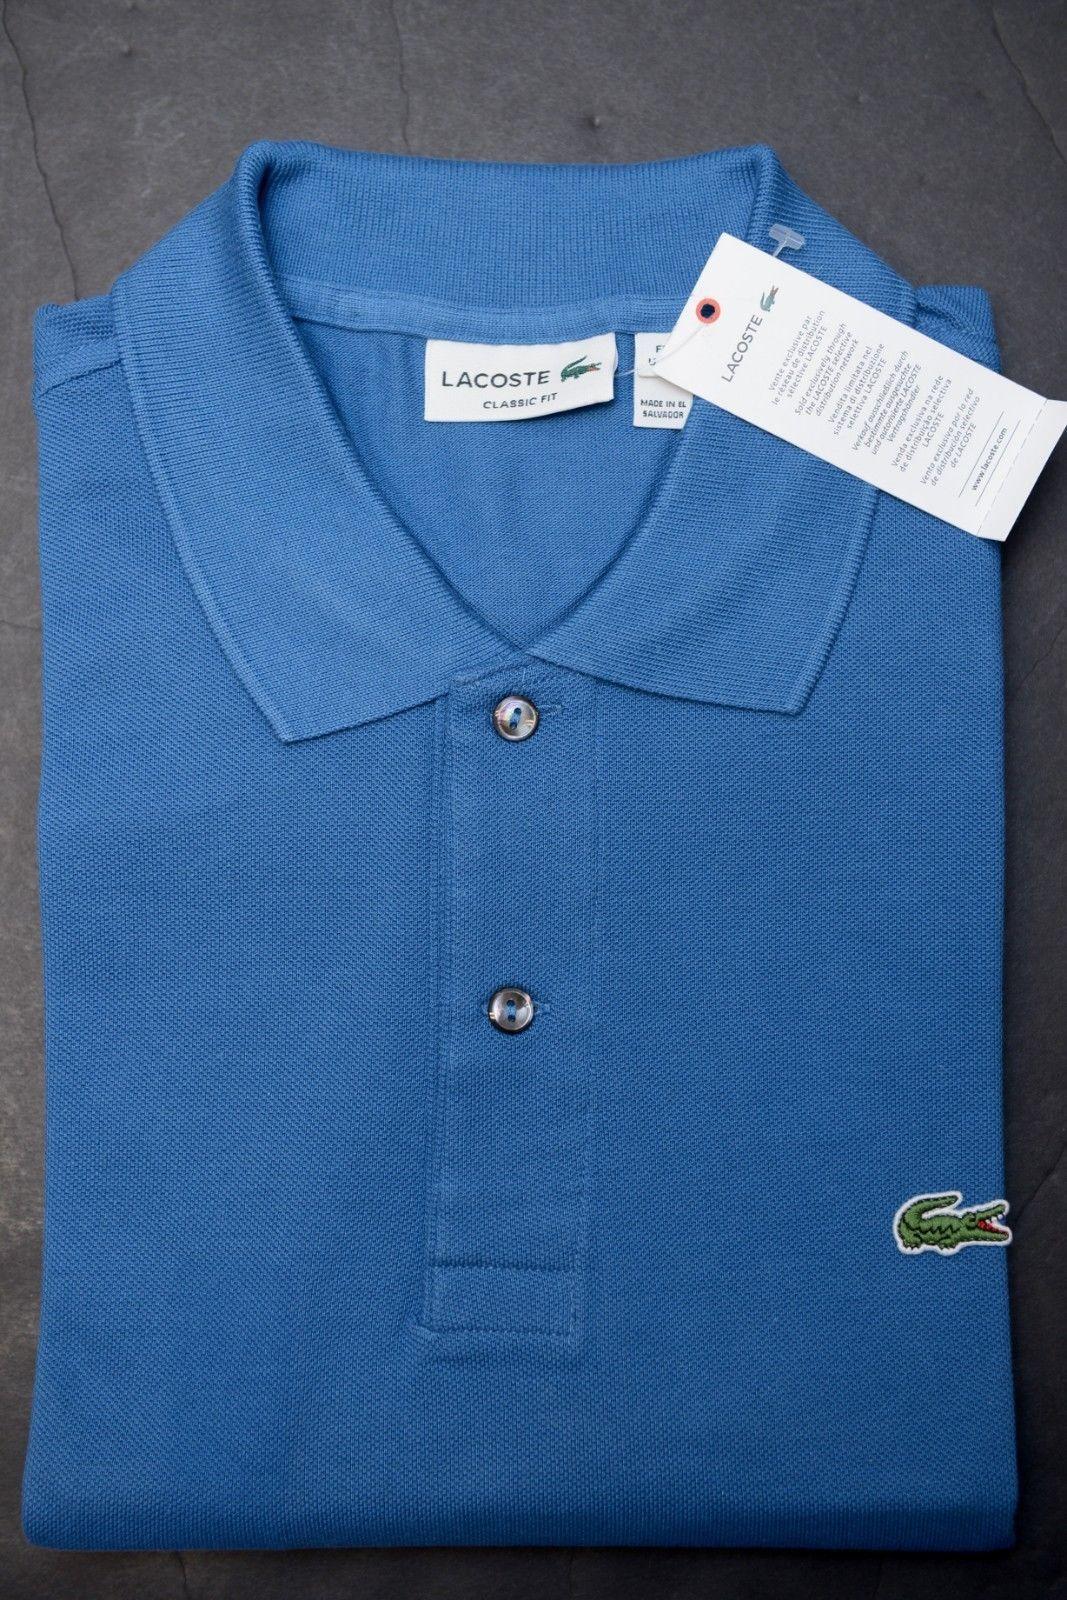 fc25393005df7c S l1600. S l1600. Previous. SALE Lacoste L1212 Men's Classic Fit Officer  Blue Cotton Polo Shirt NWT 2XL EU 7